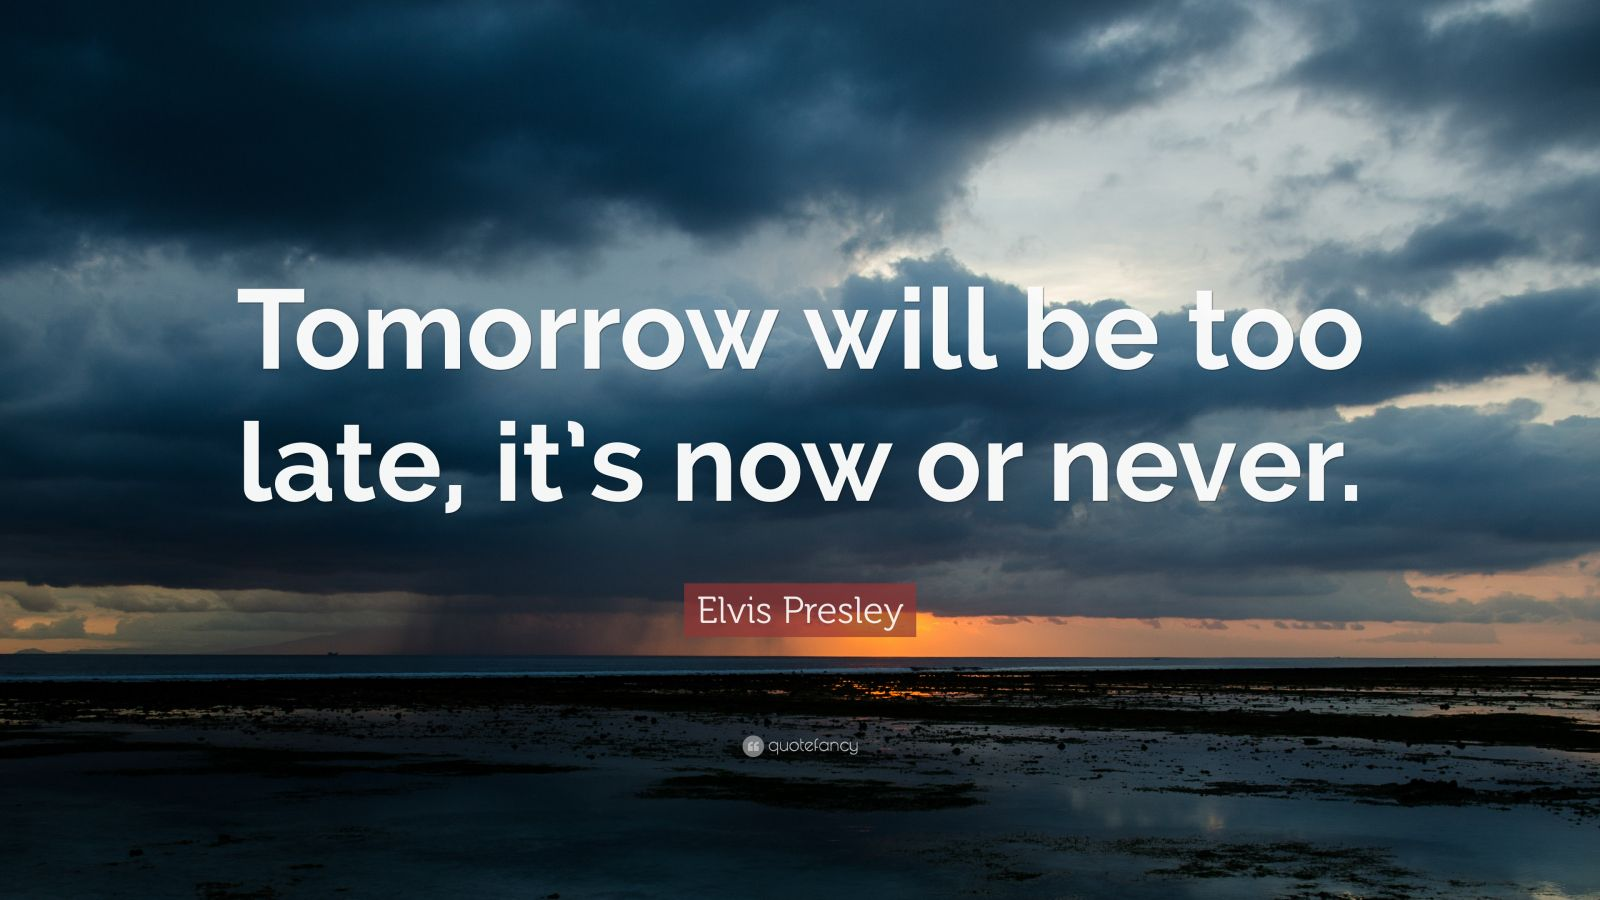 elvis presley quote: